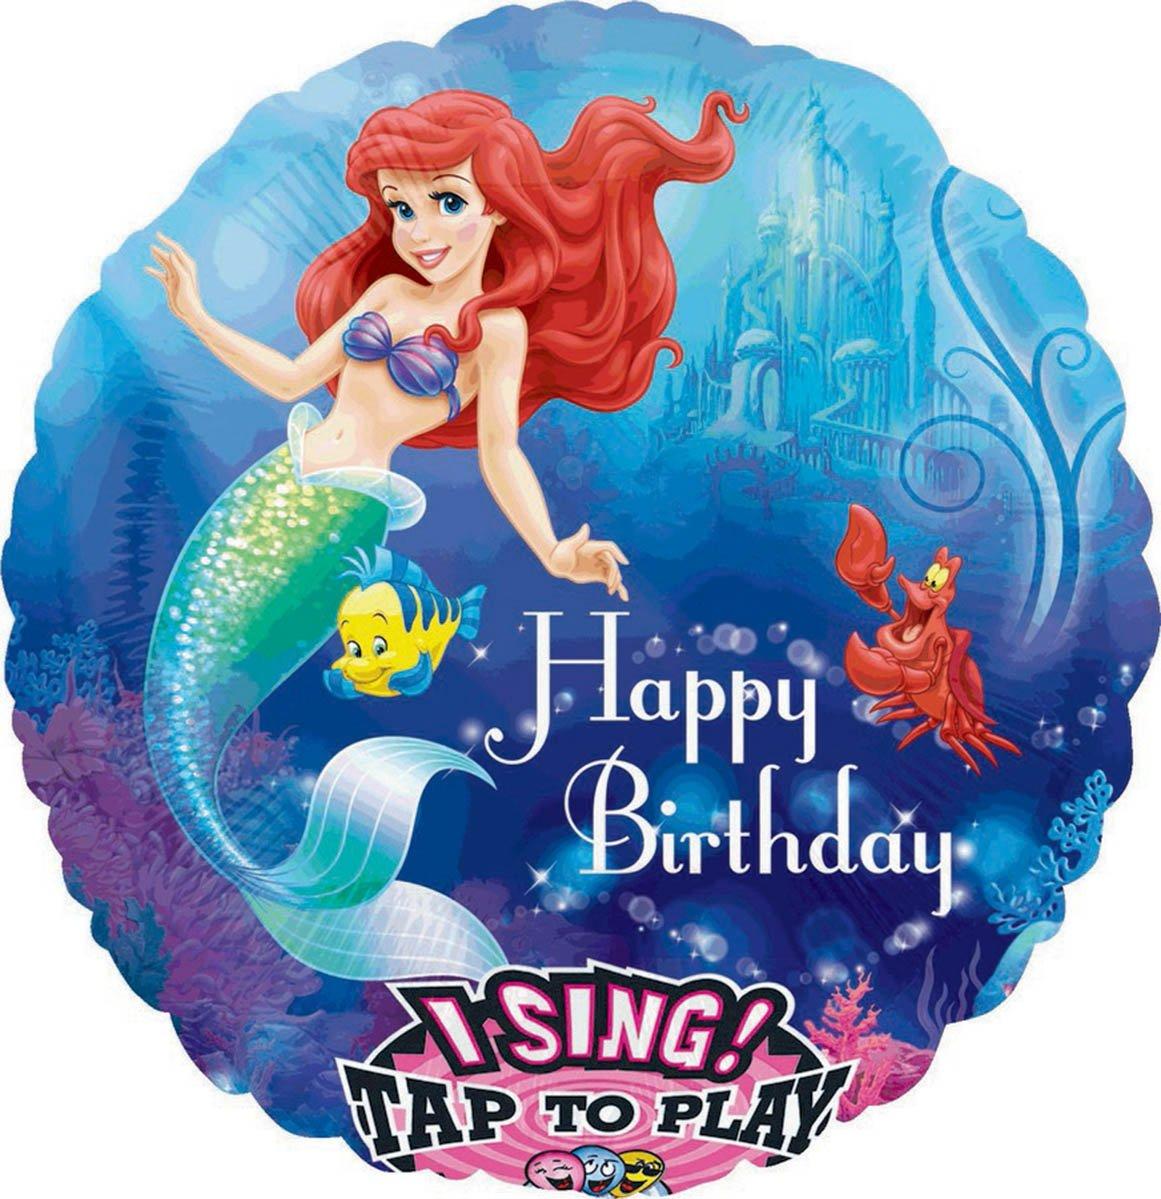 Sing-A-Tune Little Mermaid Happy Birthday P75